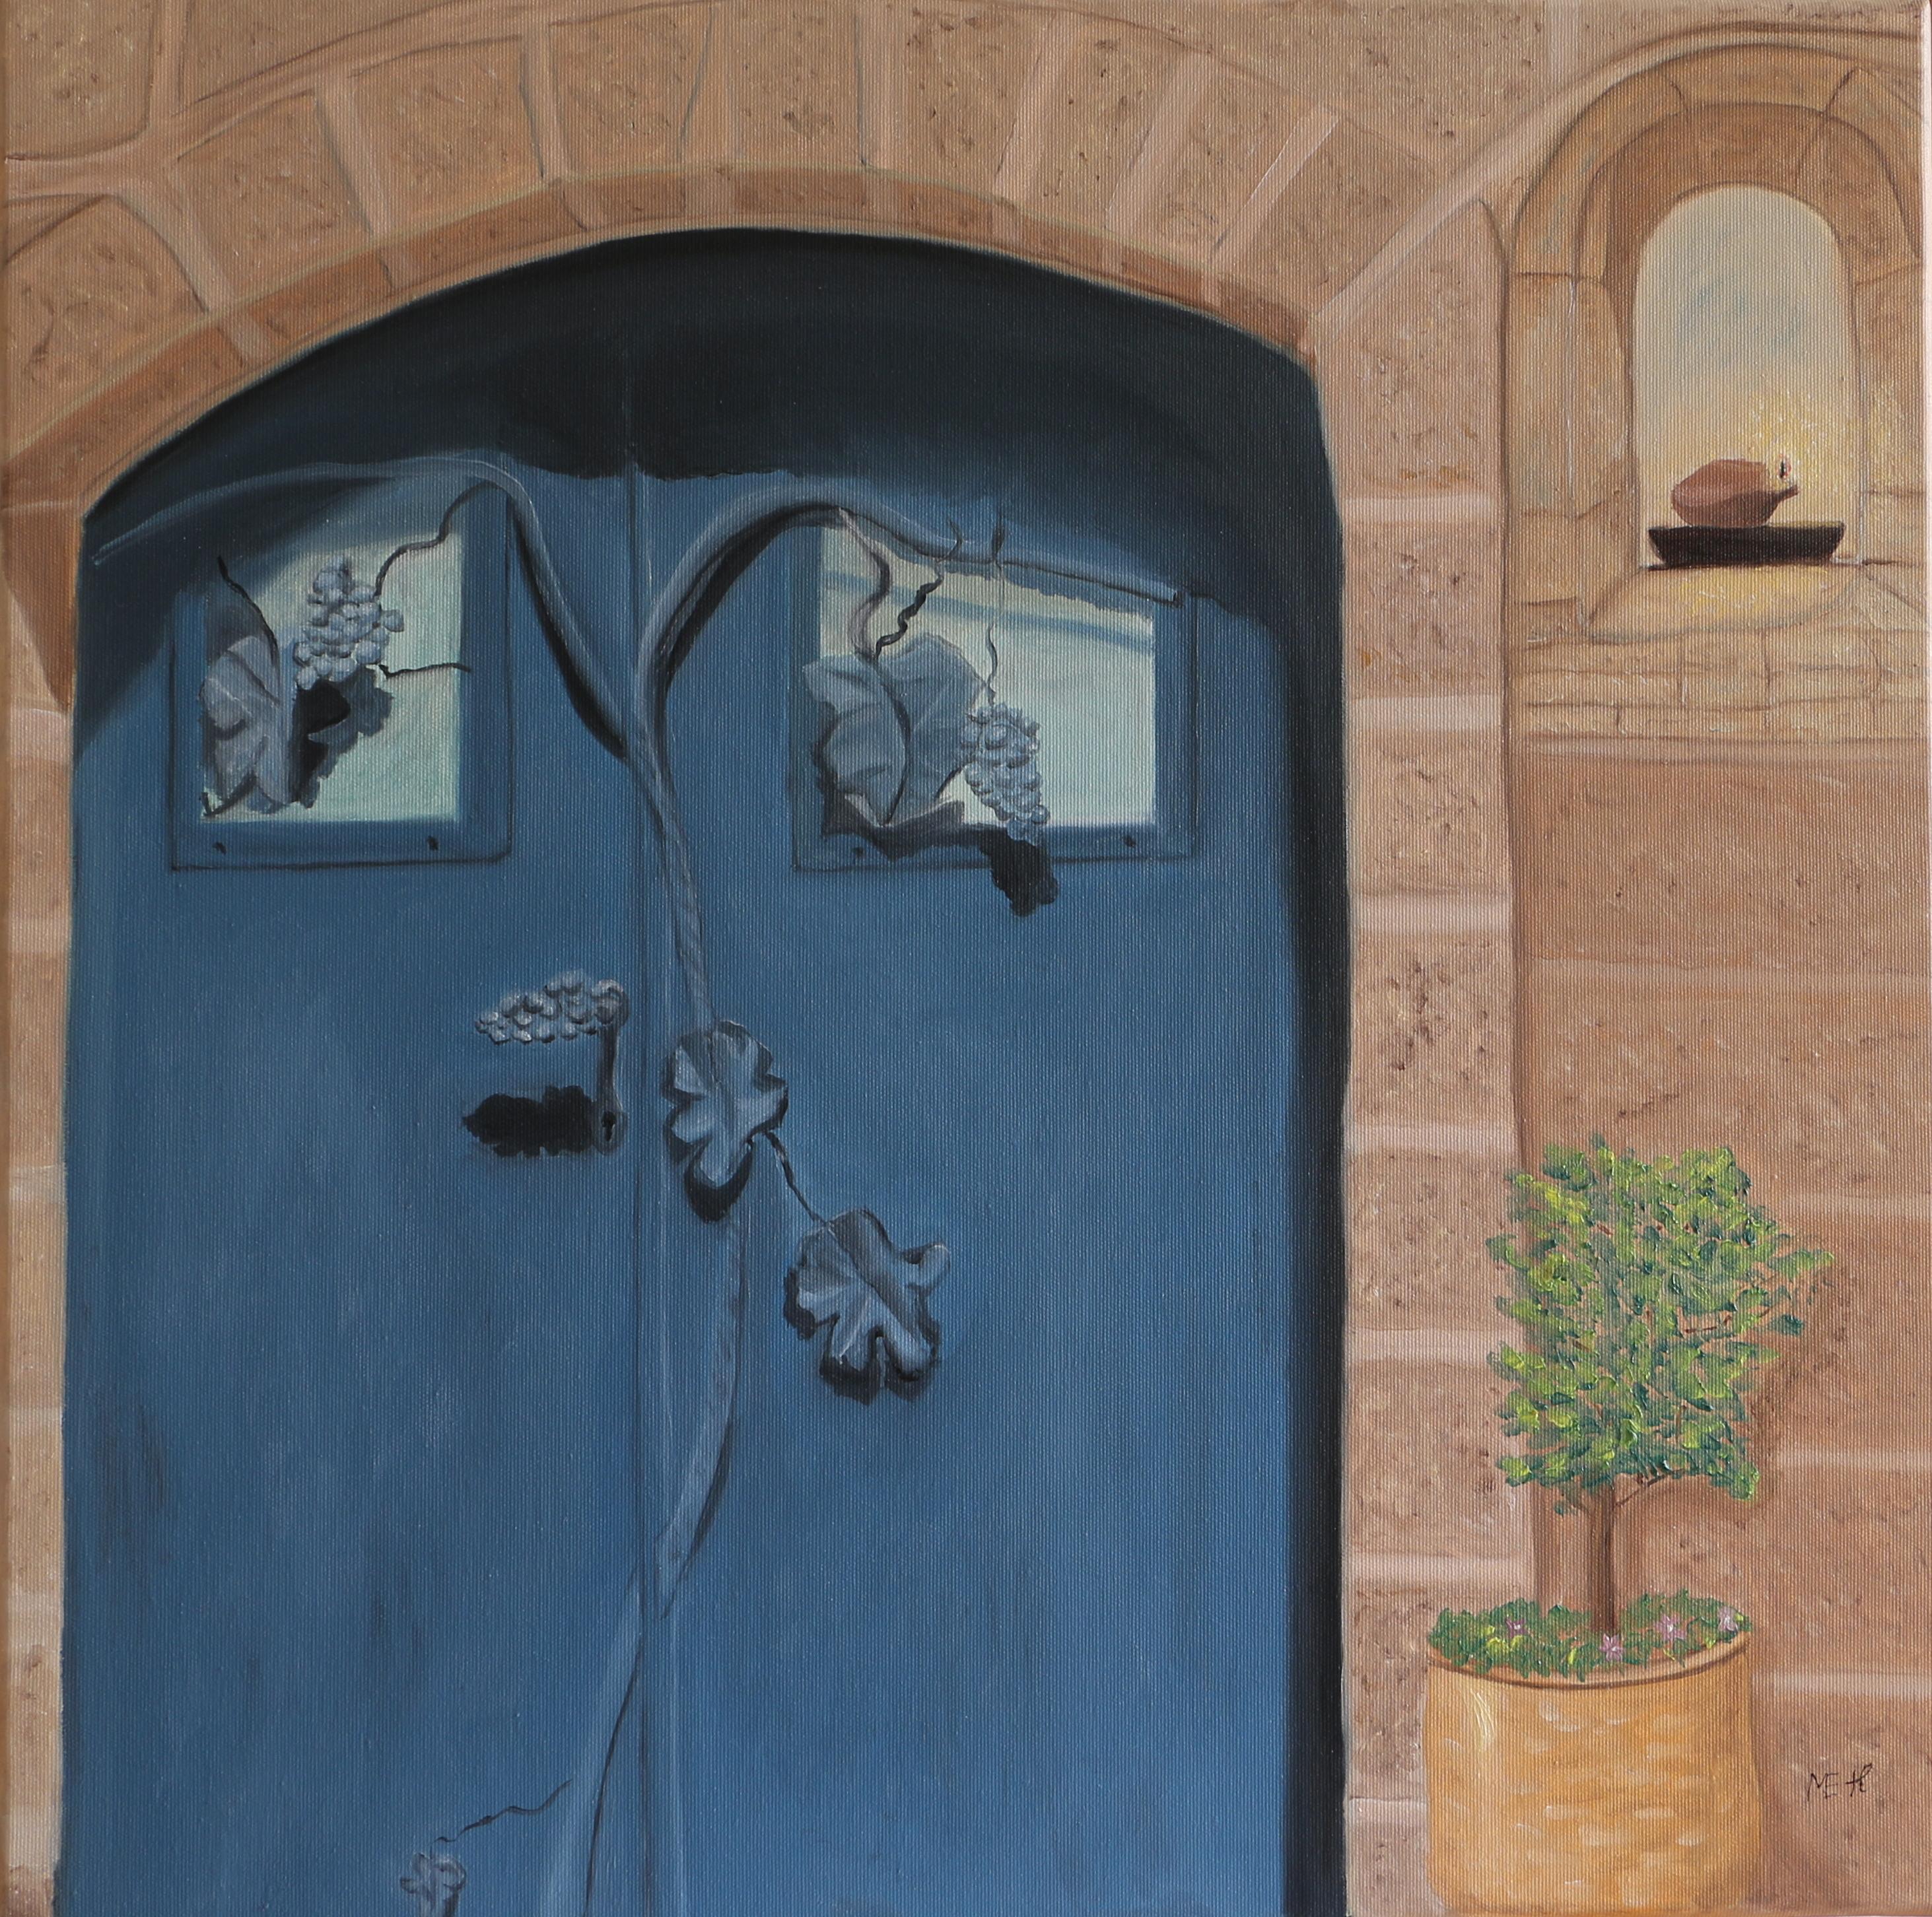 Knock, 60x60cm